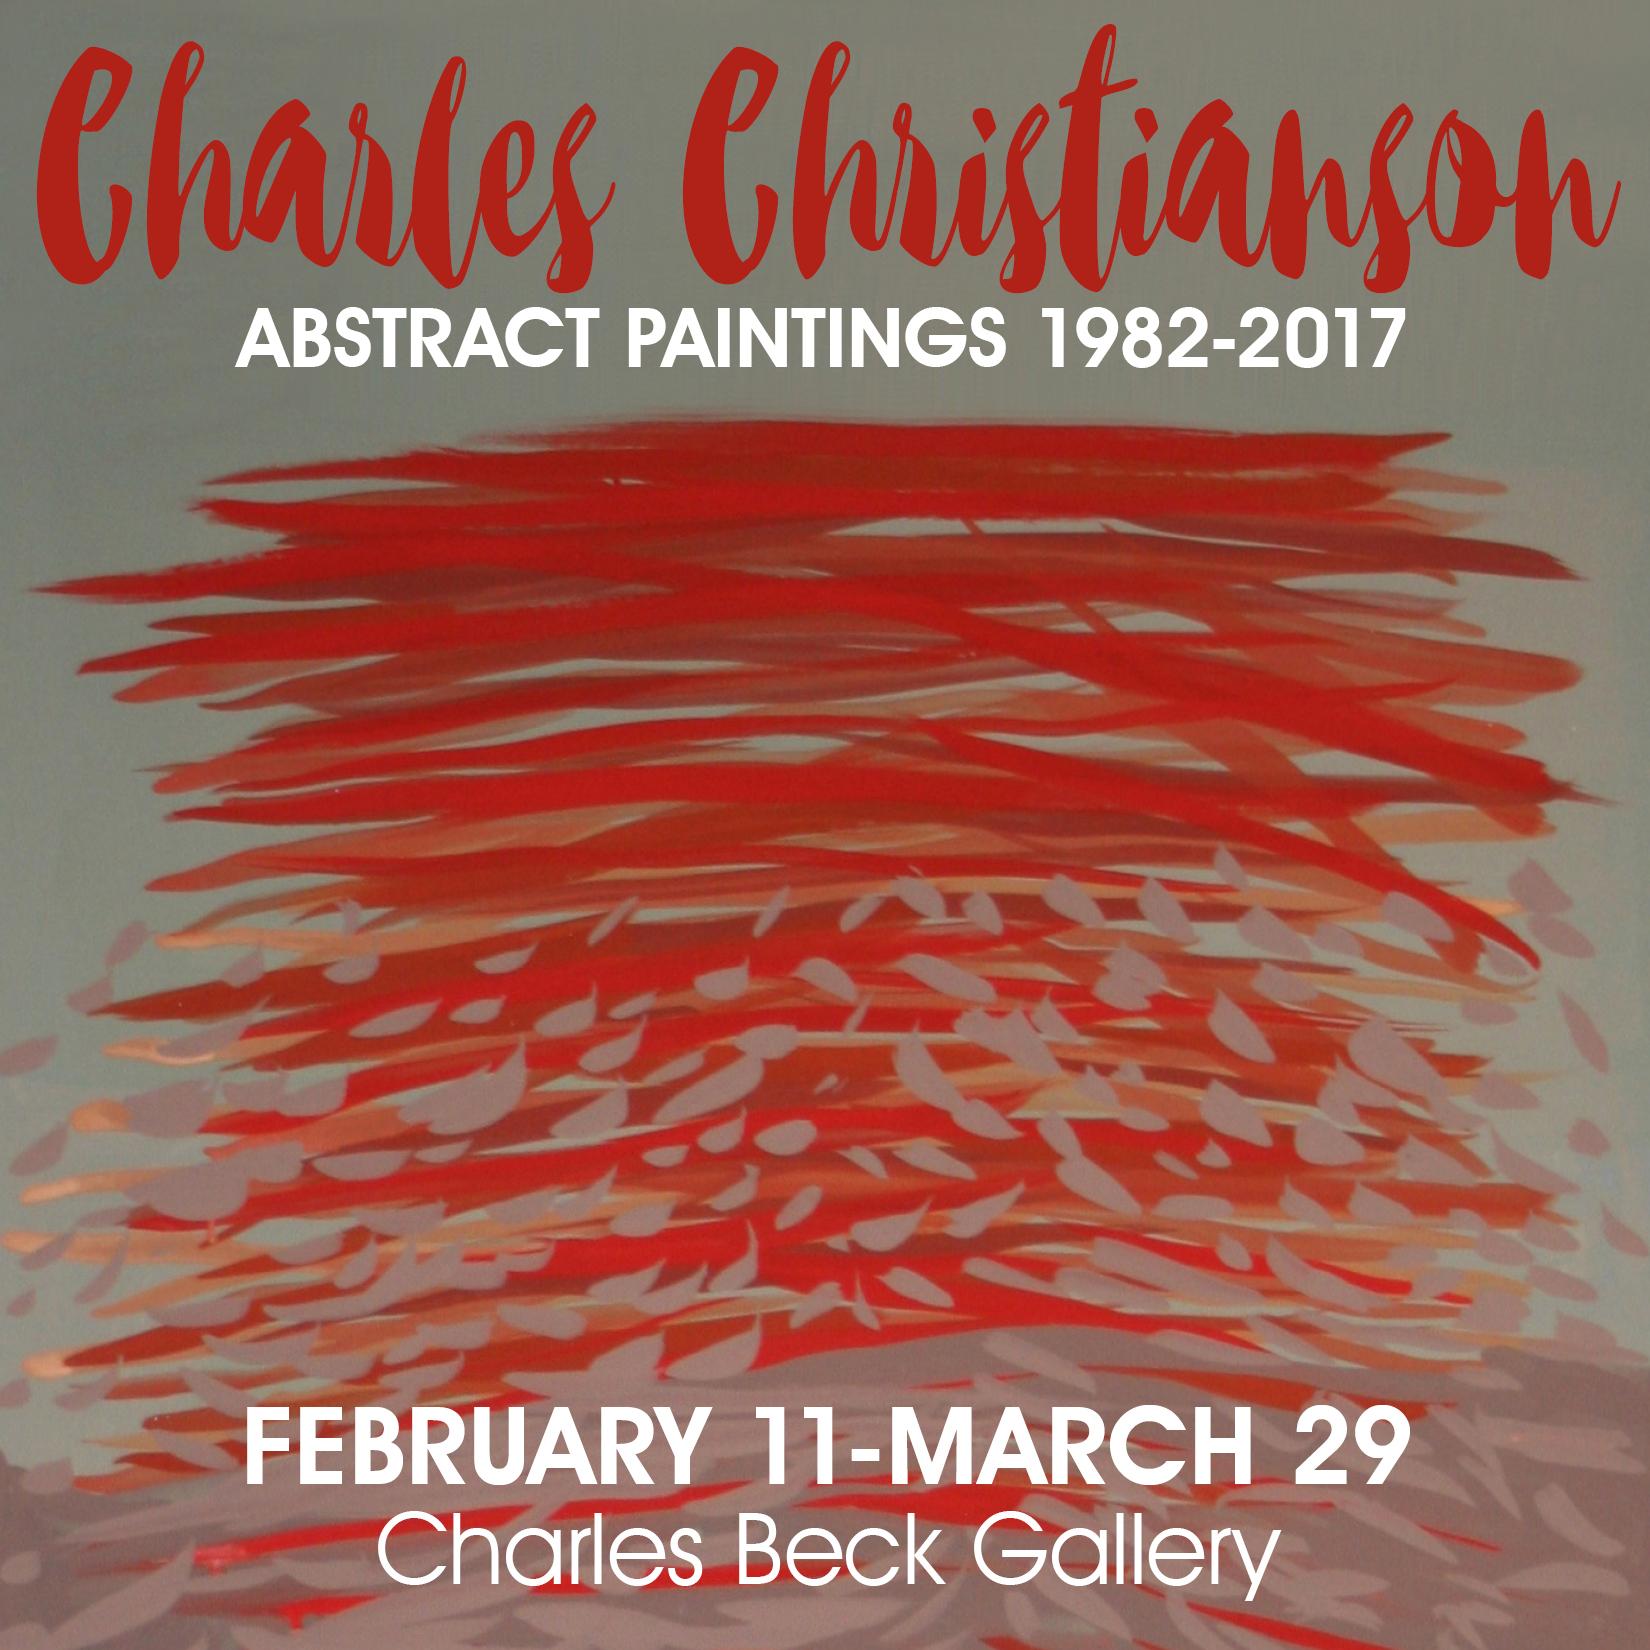 Charles Christianson.jpg